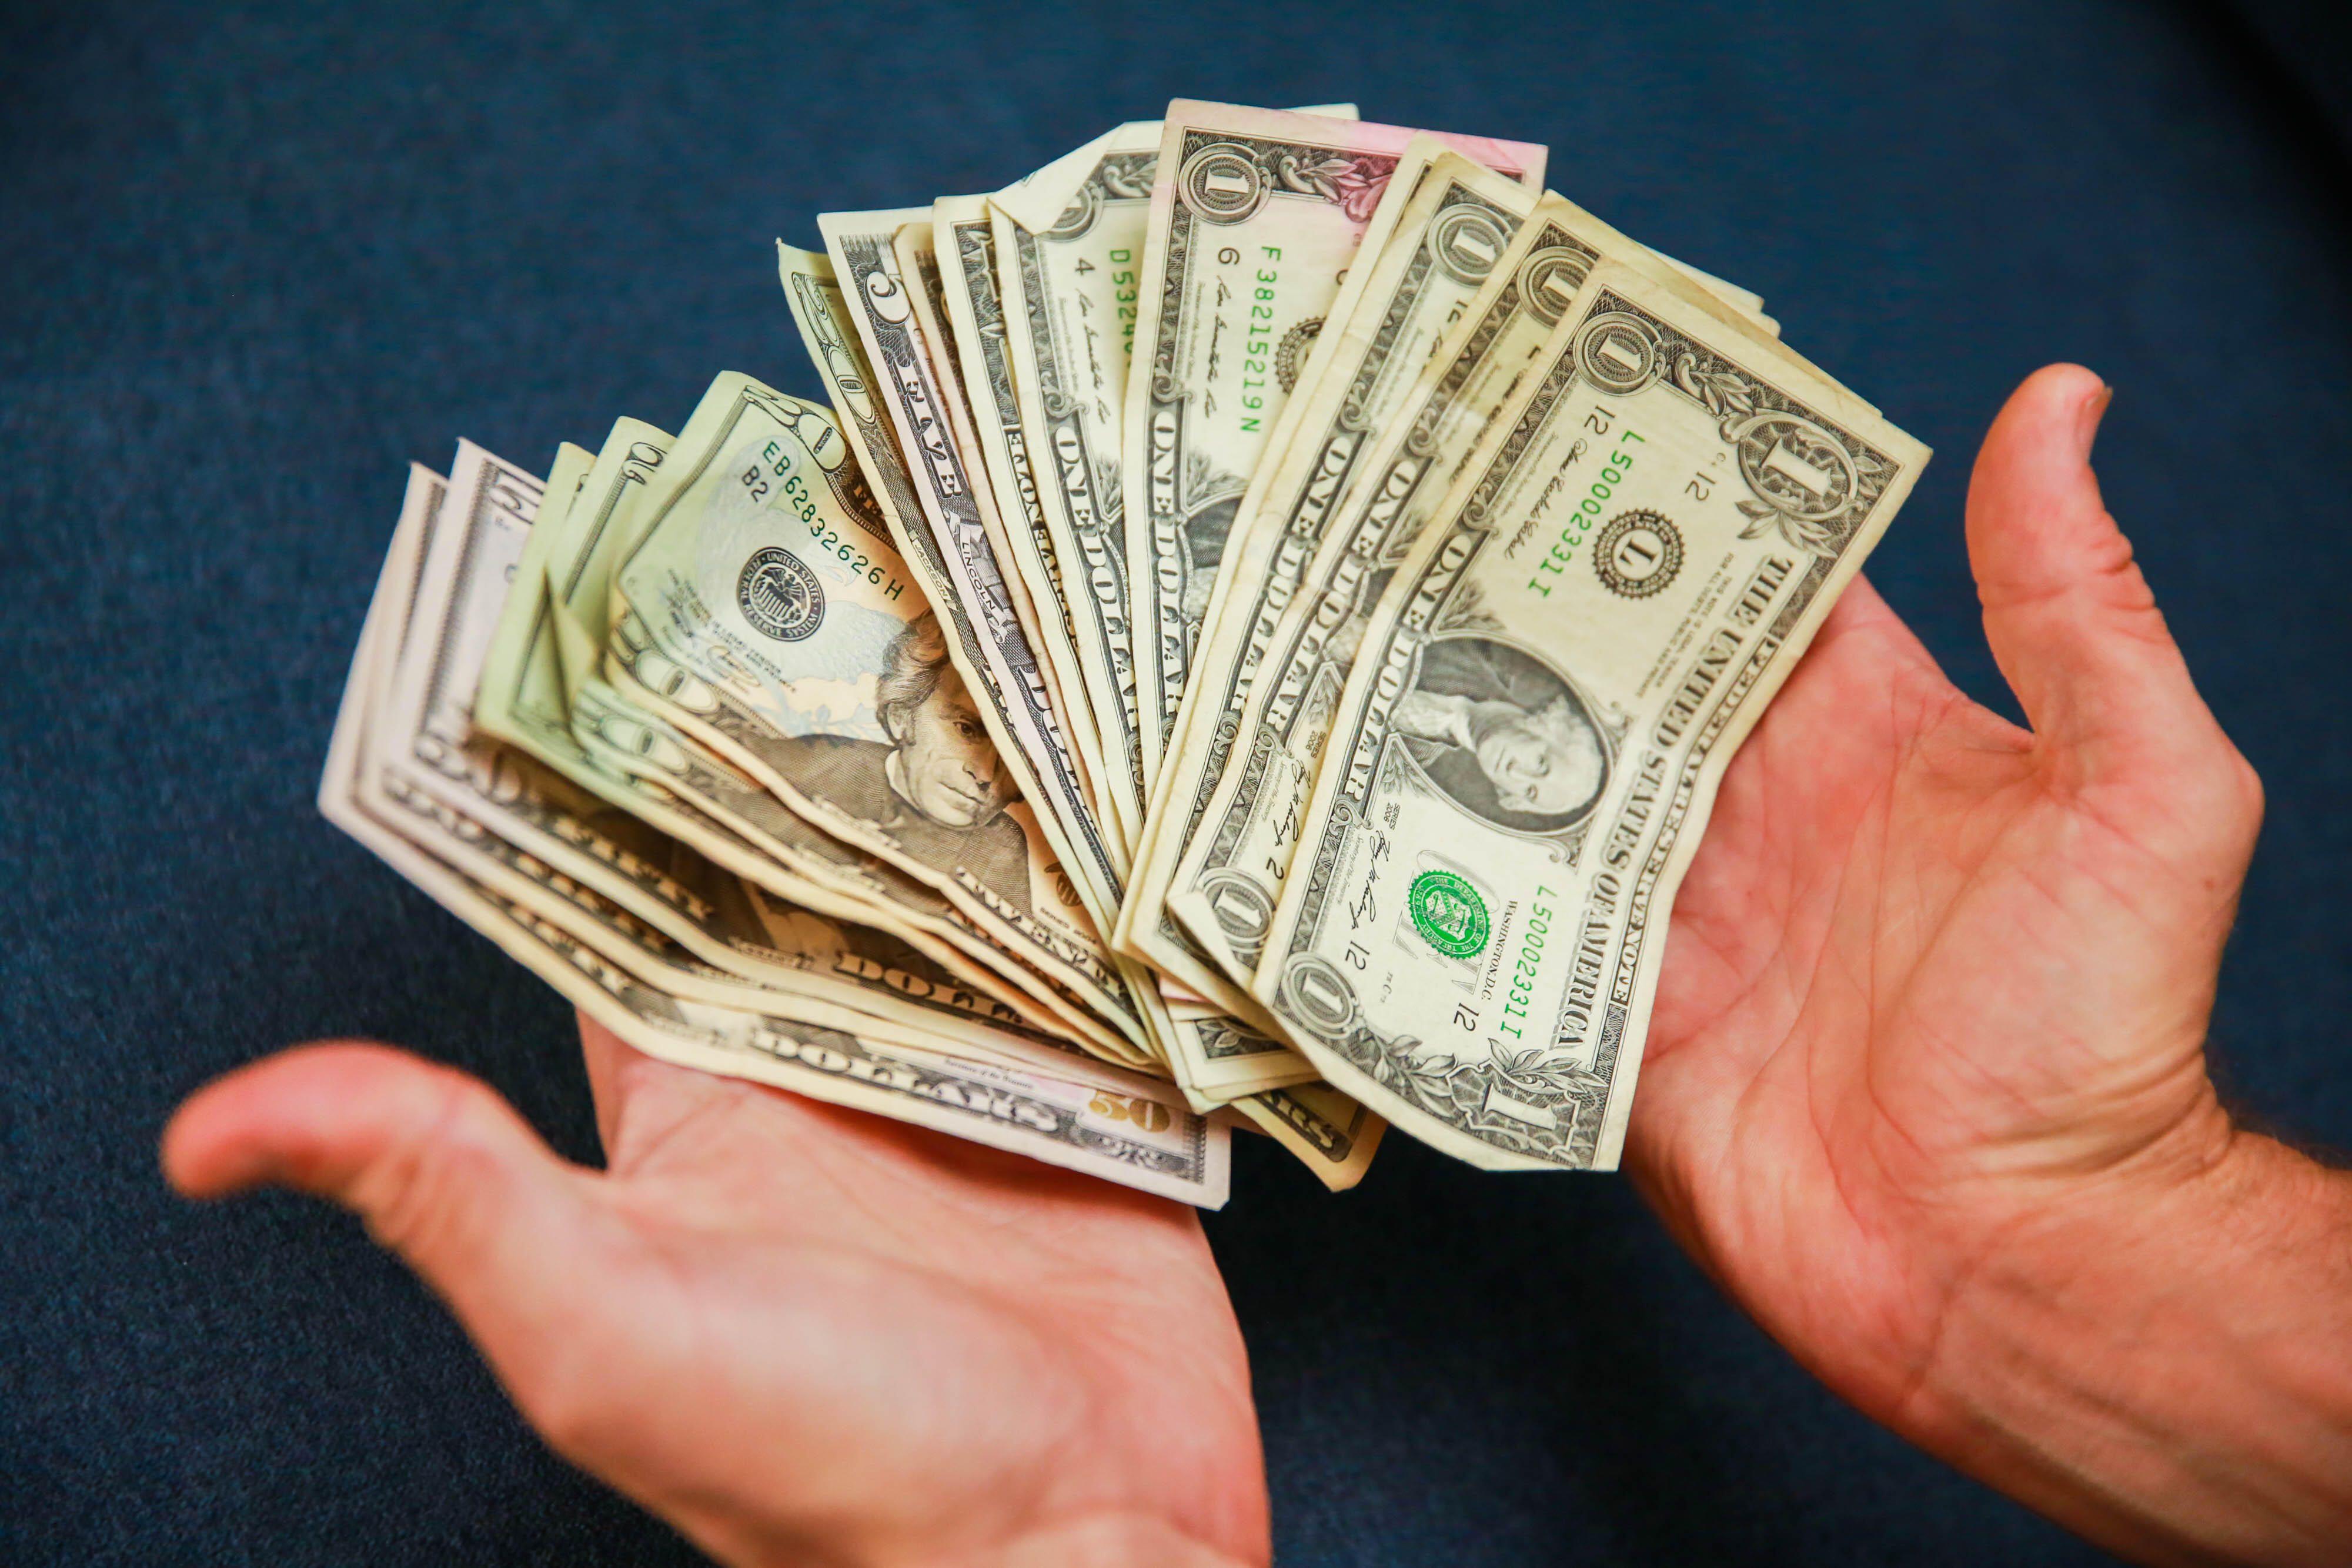 003-counting-cash-money-dollar-bills-hands-blue-background-stimulus-2020